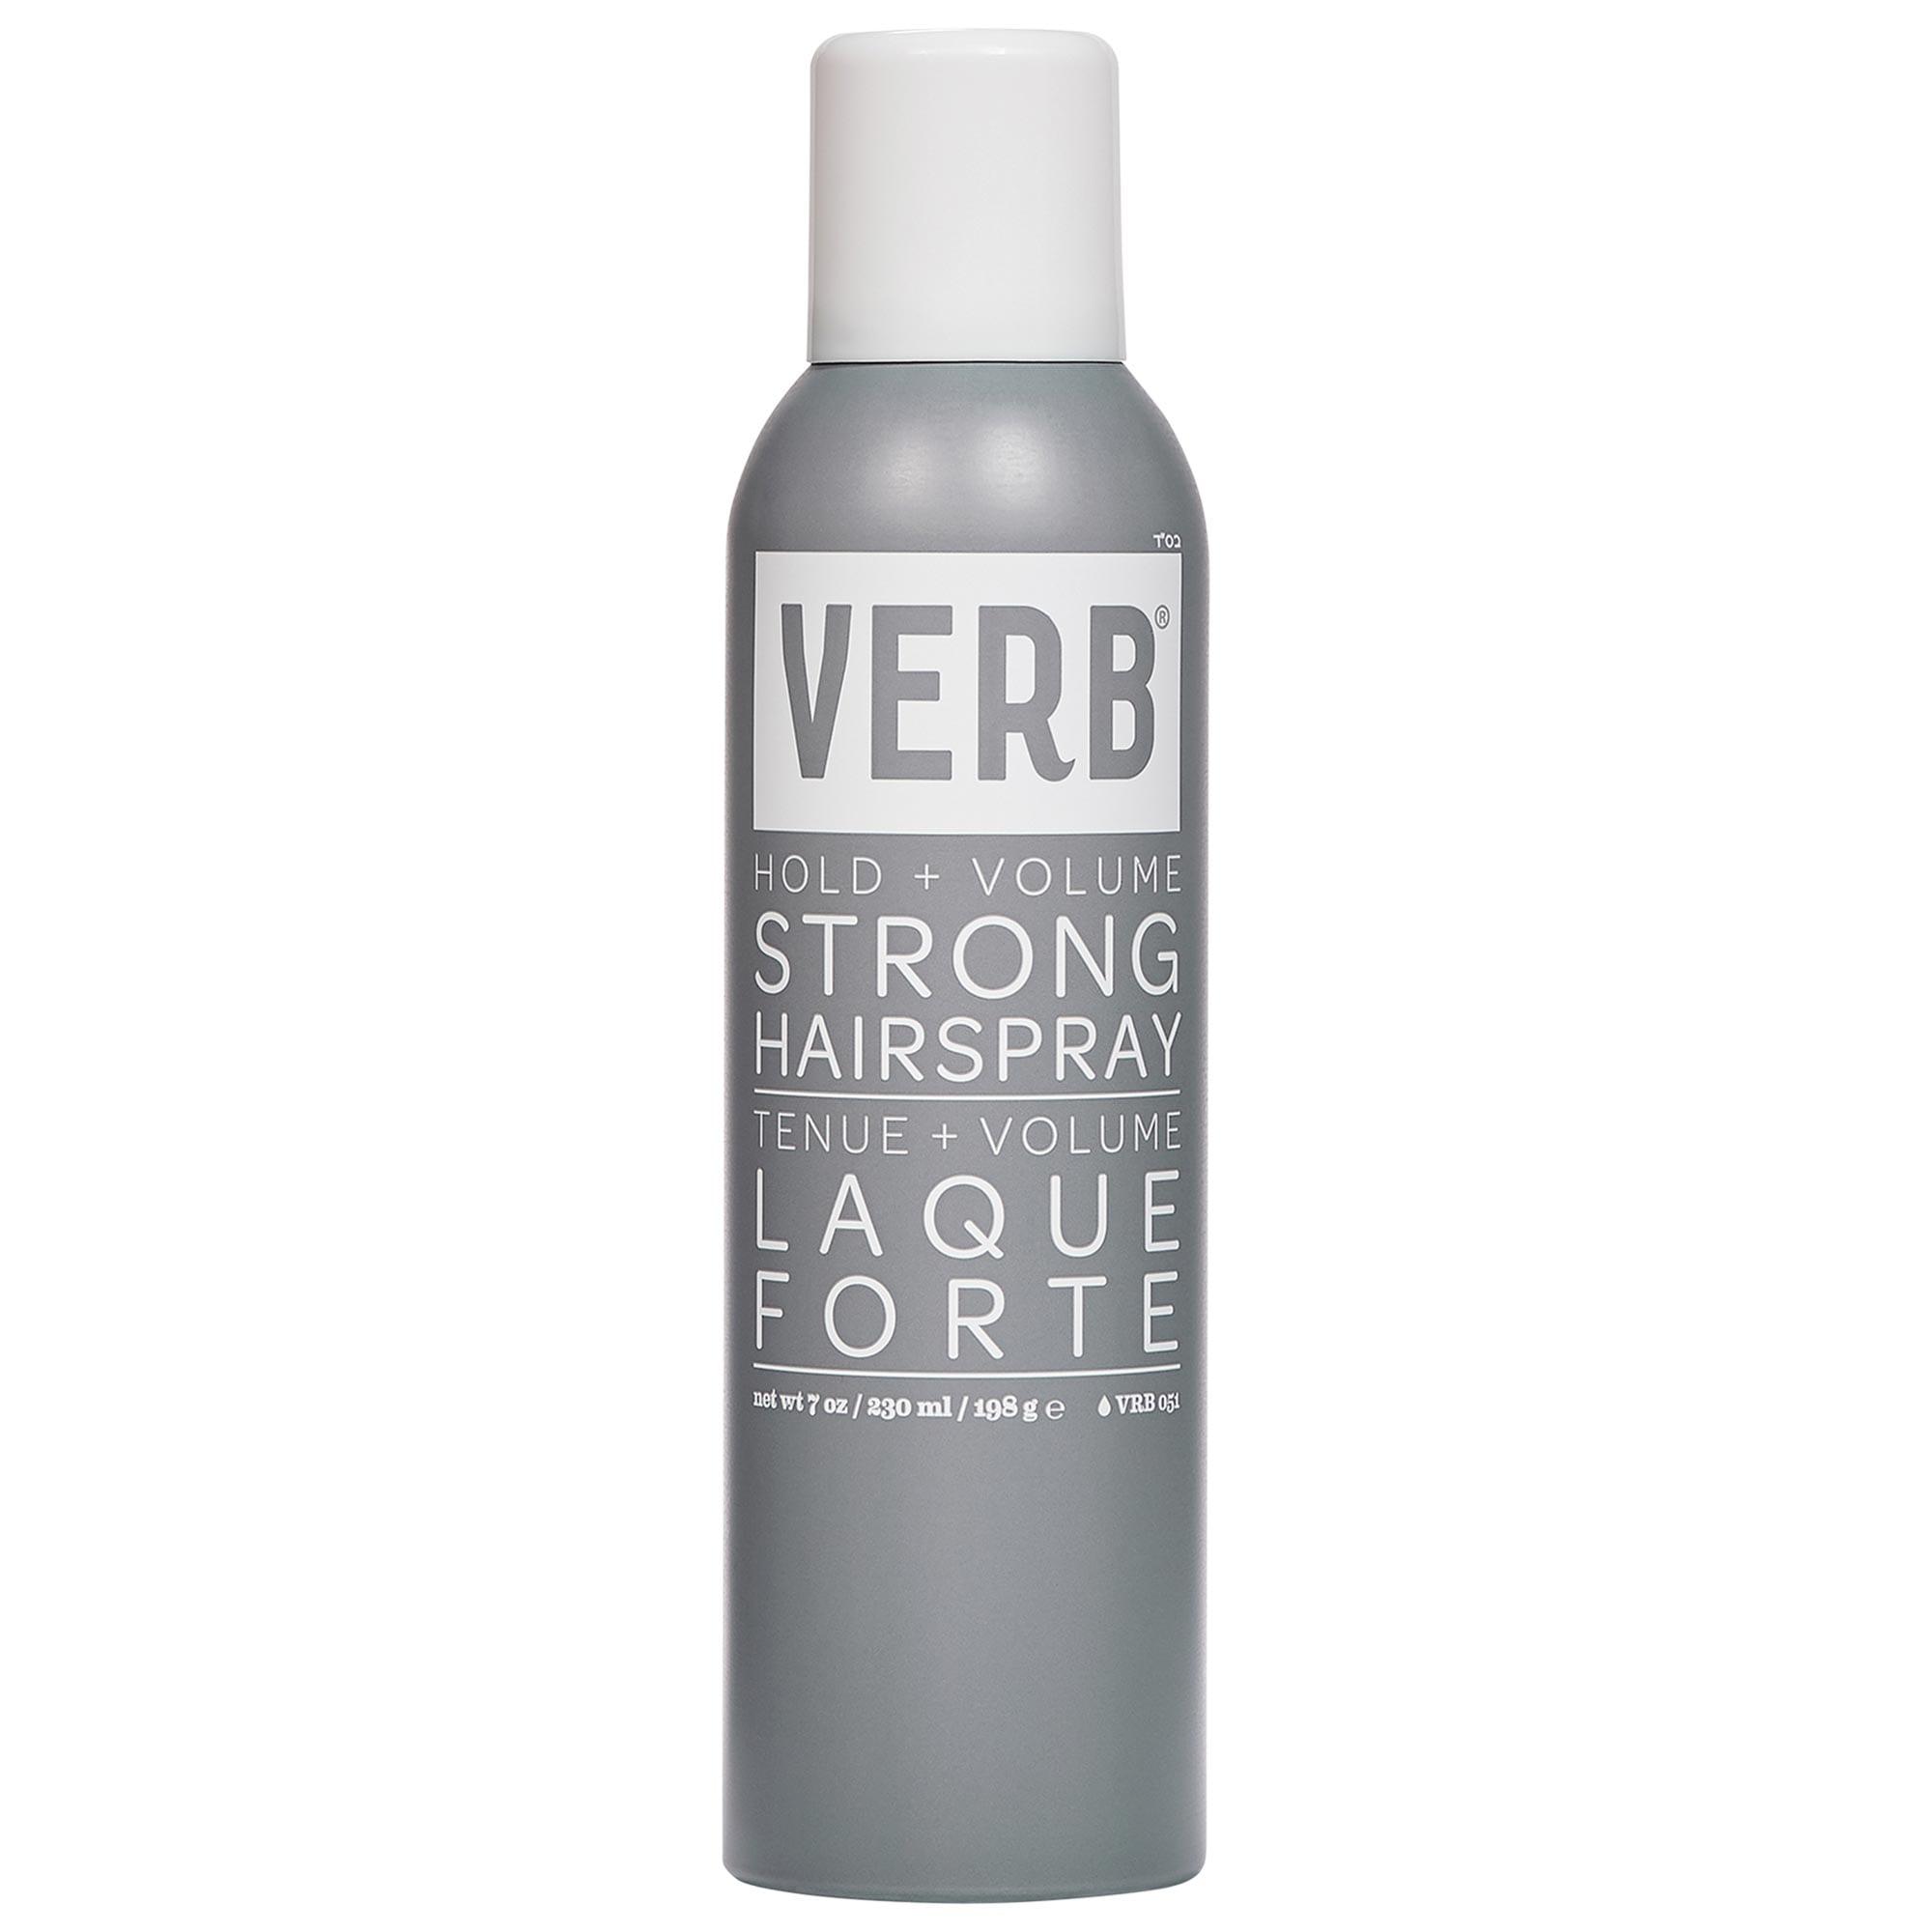 verb - Strong Hairspray